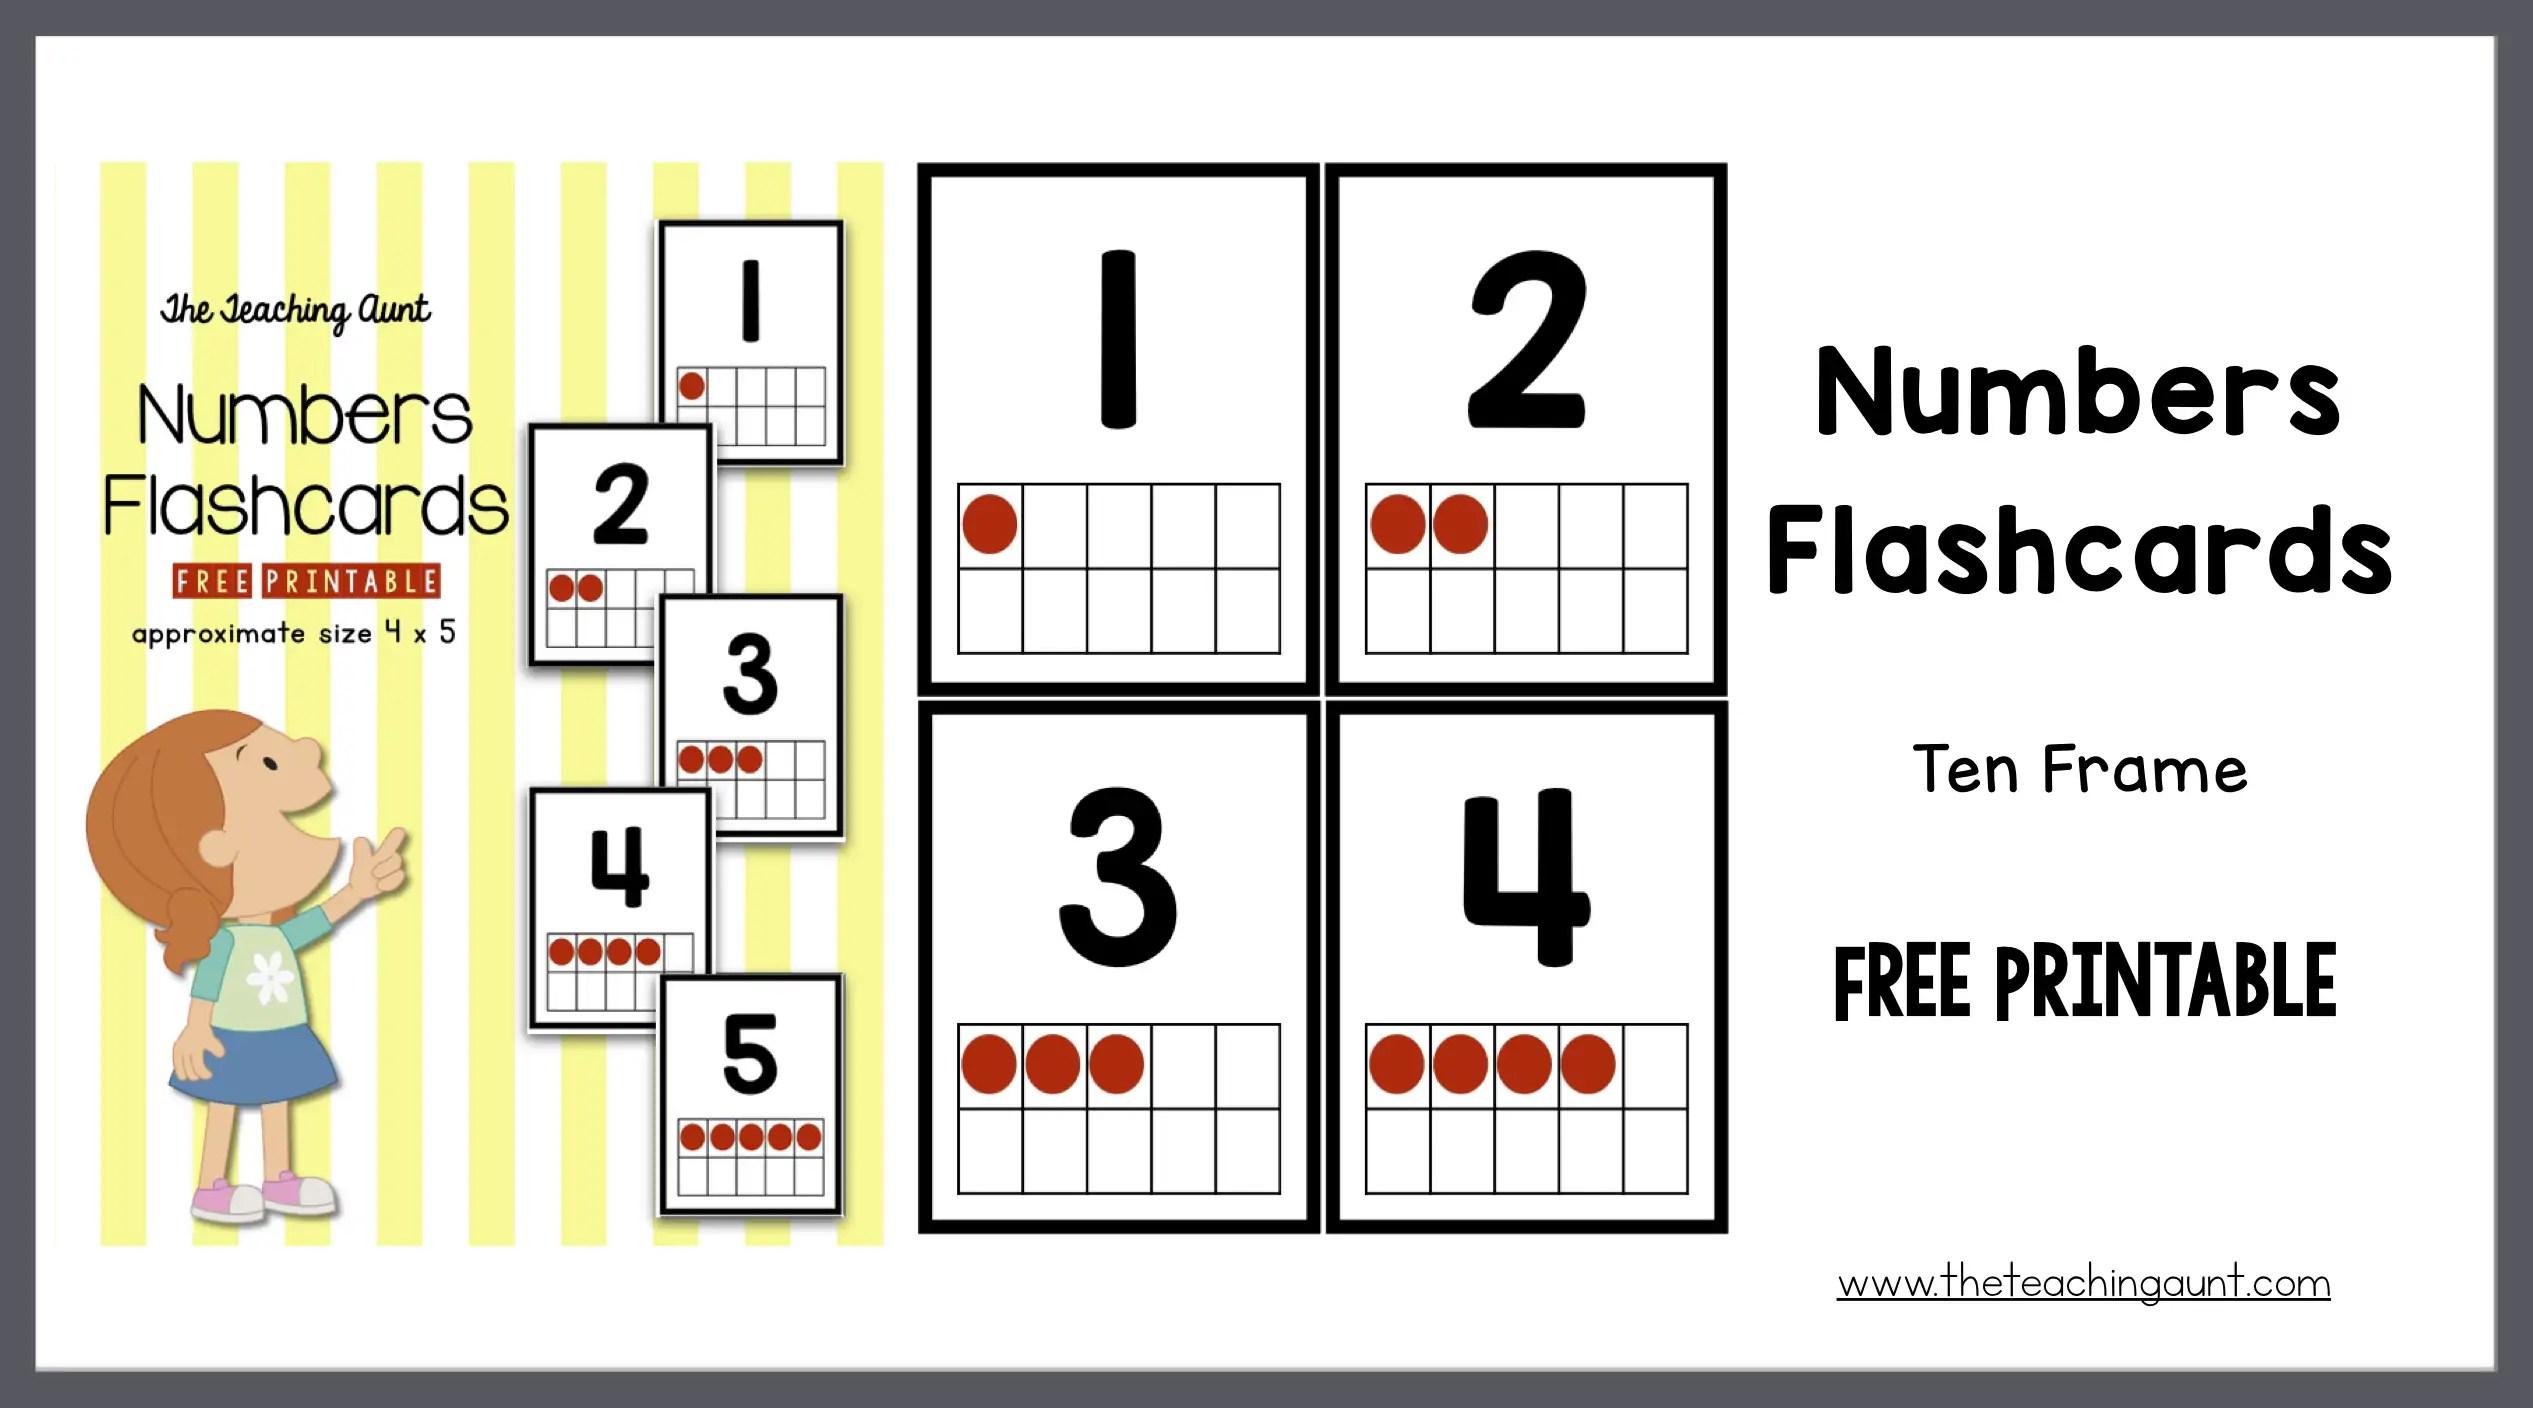 image regarding Free Printable Ten Frames known as Figures Flashcards 10 Body - The Coaching Aunt